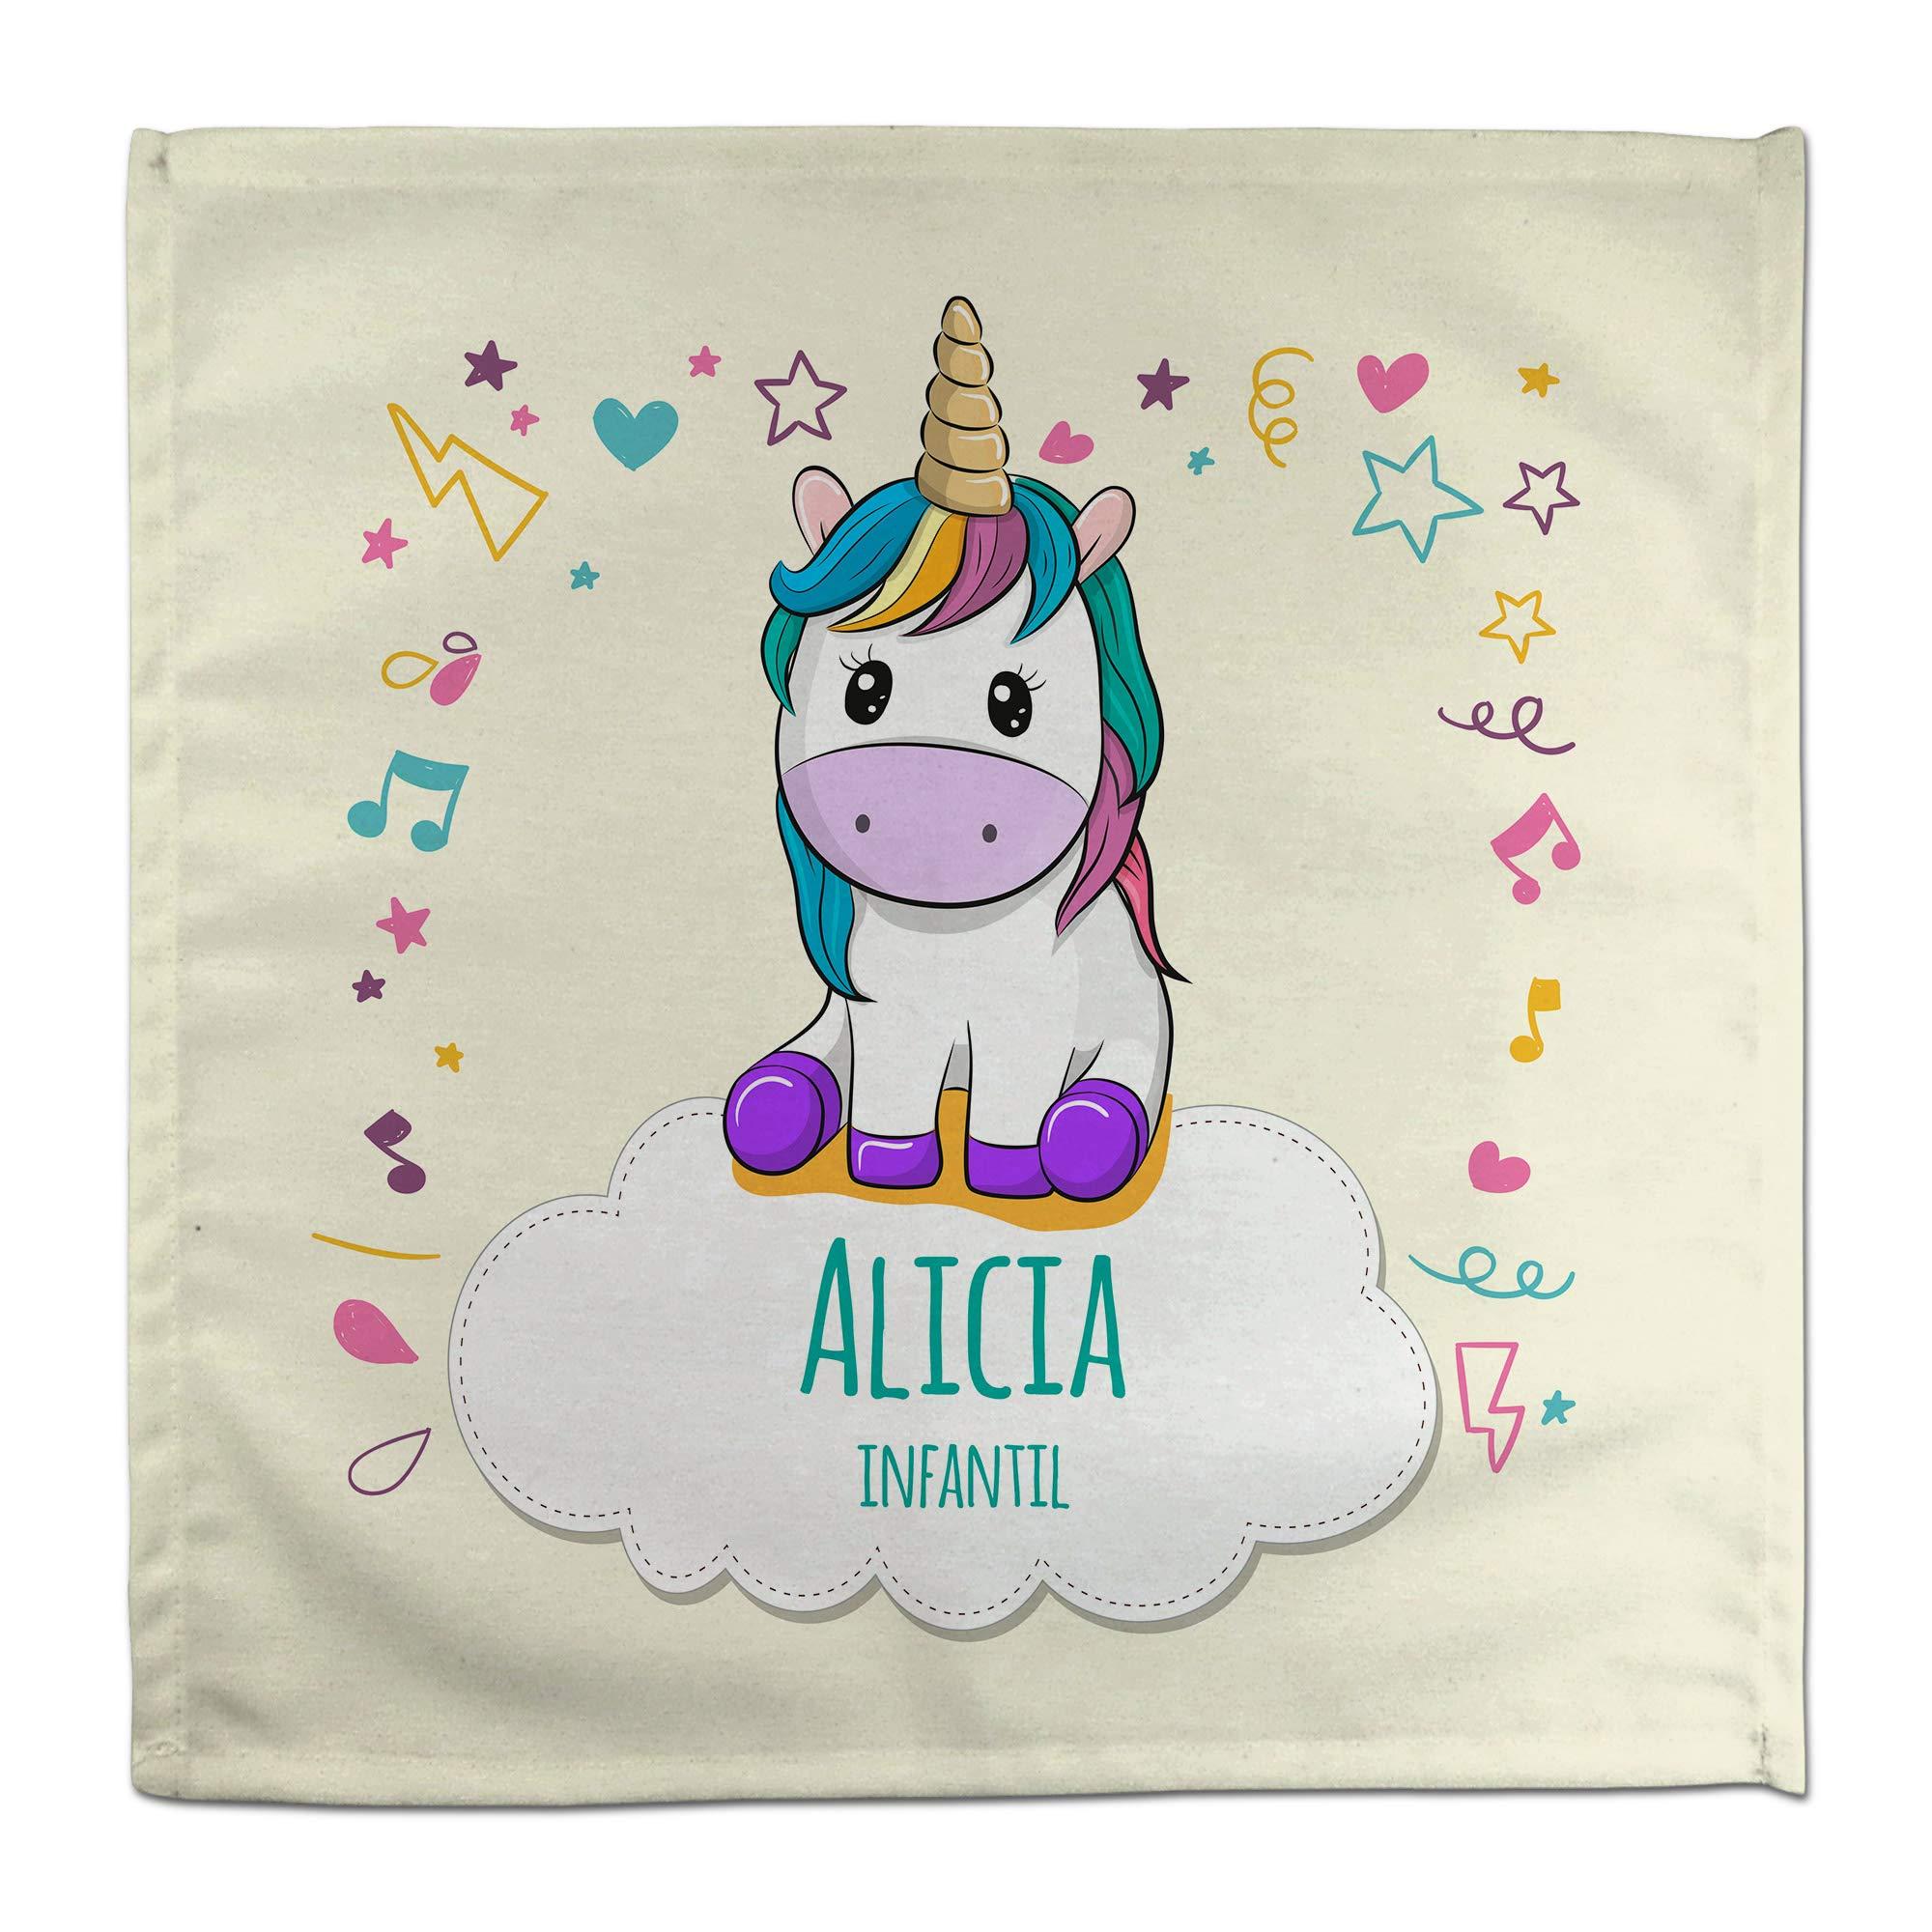 Servilleta Unicornio Personalizada Vuelta al Cole con Nombre y ...